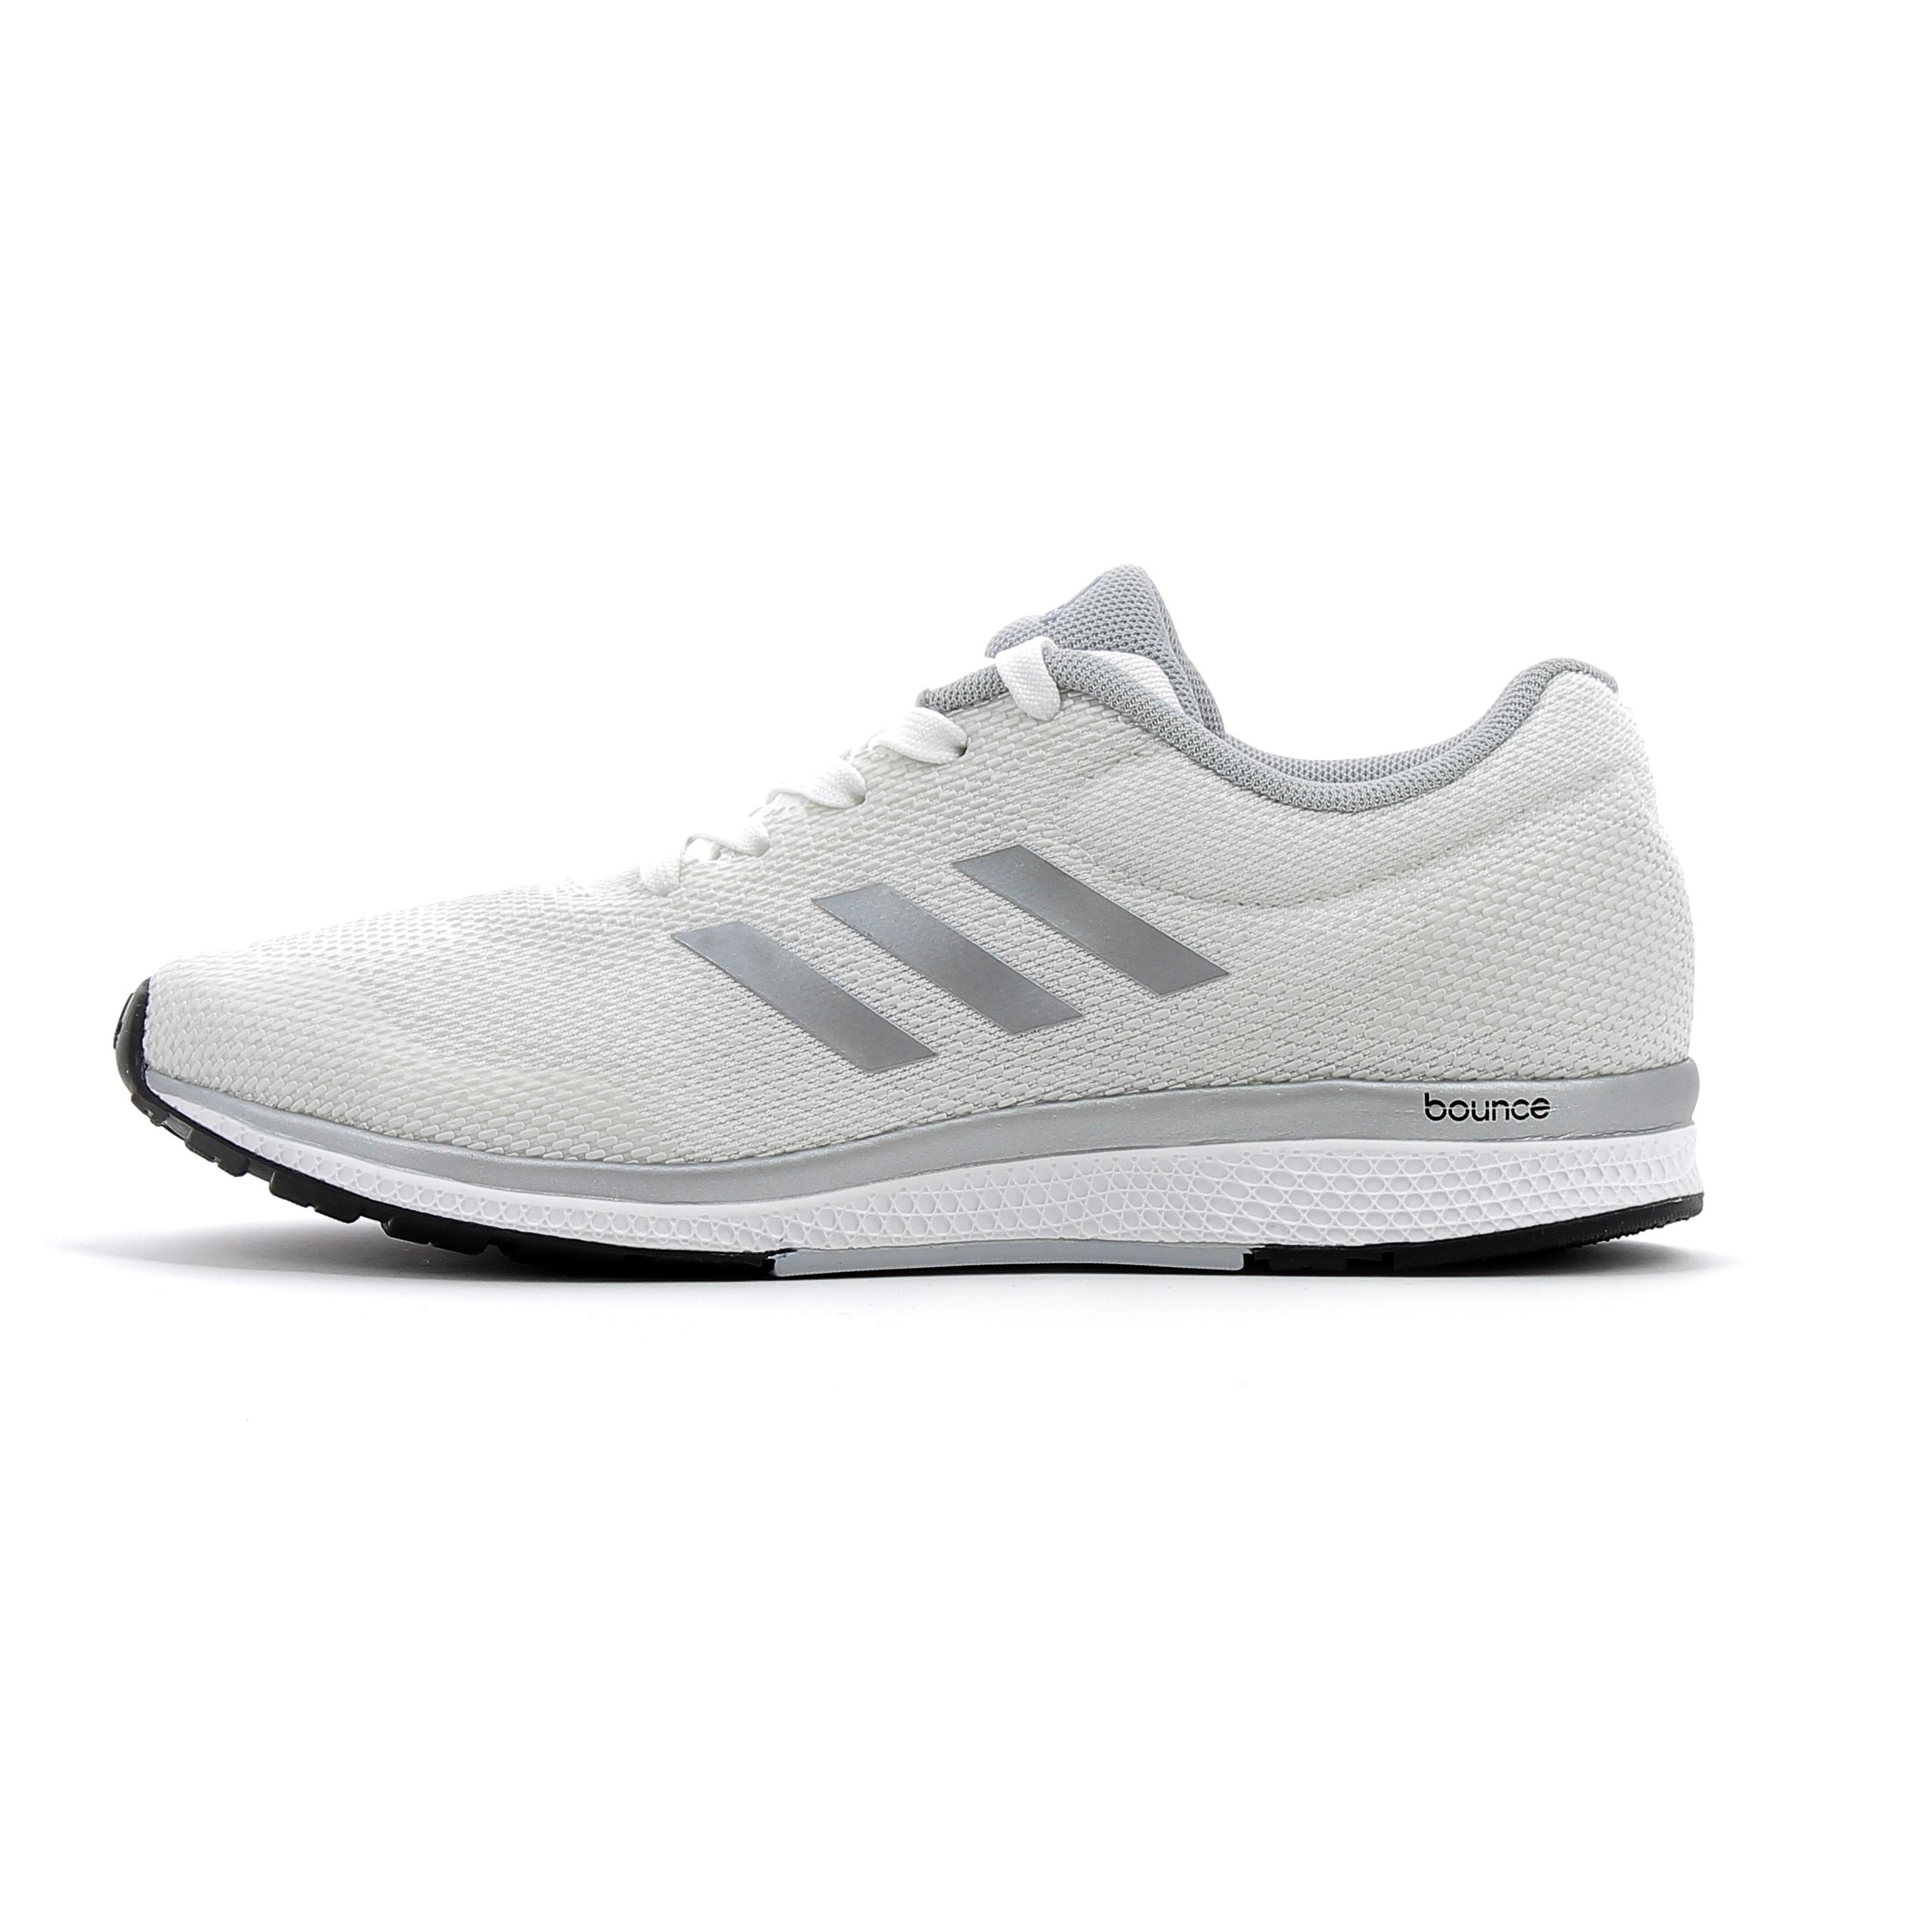 new style e3bd1 77e1a Chaussures de Running Femme adidas running Mana Bounce 2 W Aramis Blanc